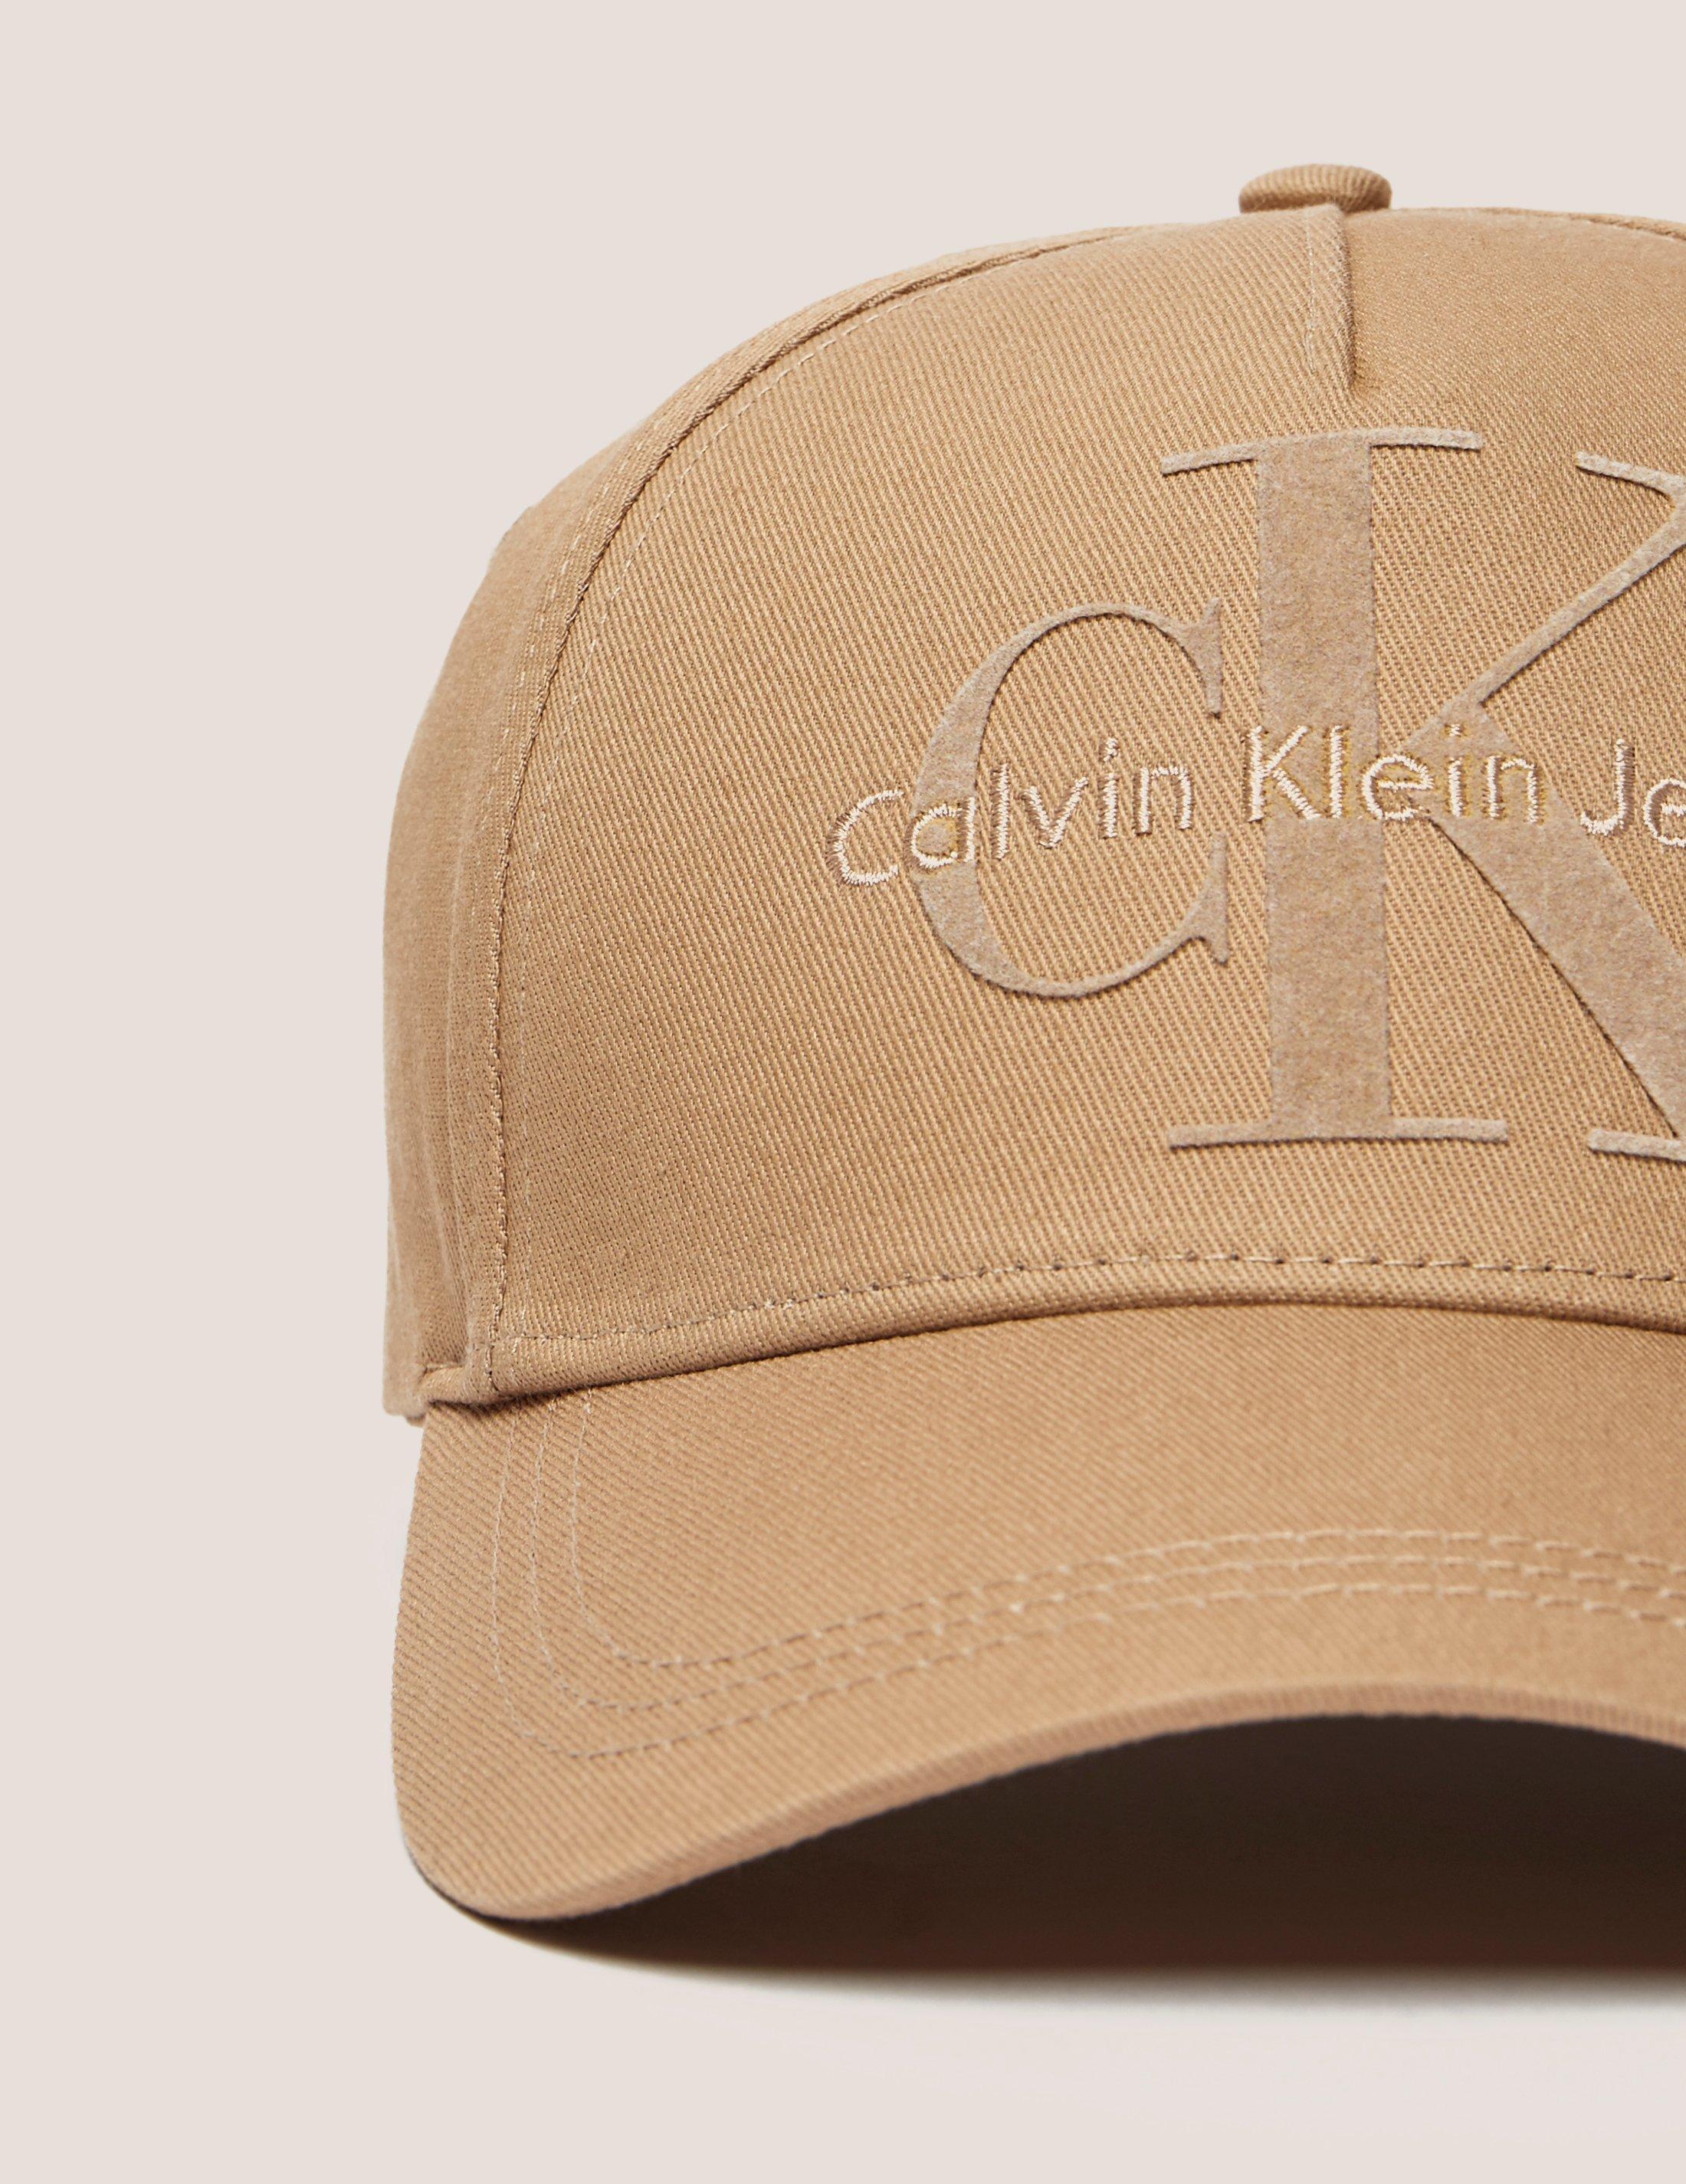 ddc0d7a96d6f1 CALVIN KLEIN 205W39NYC Mens Re-issue Baseball Cap Tan in Brown for ...